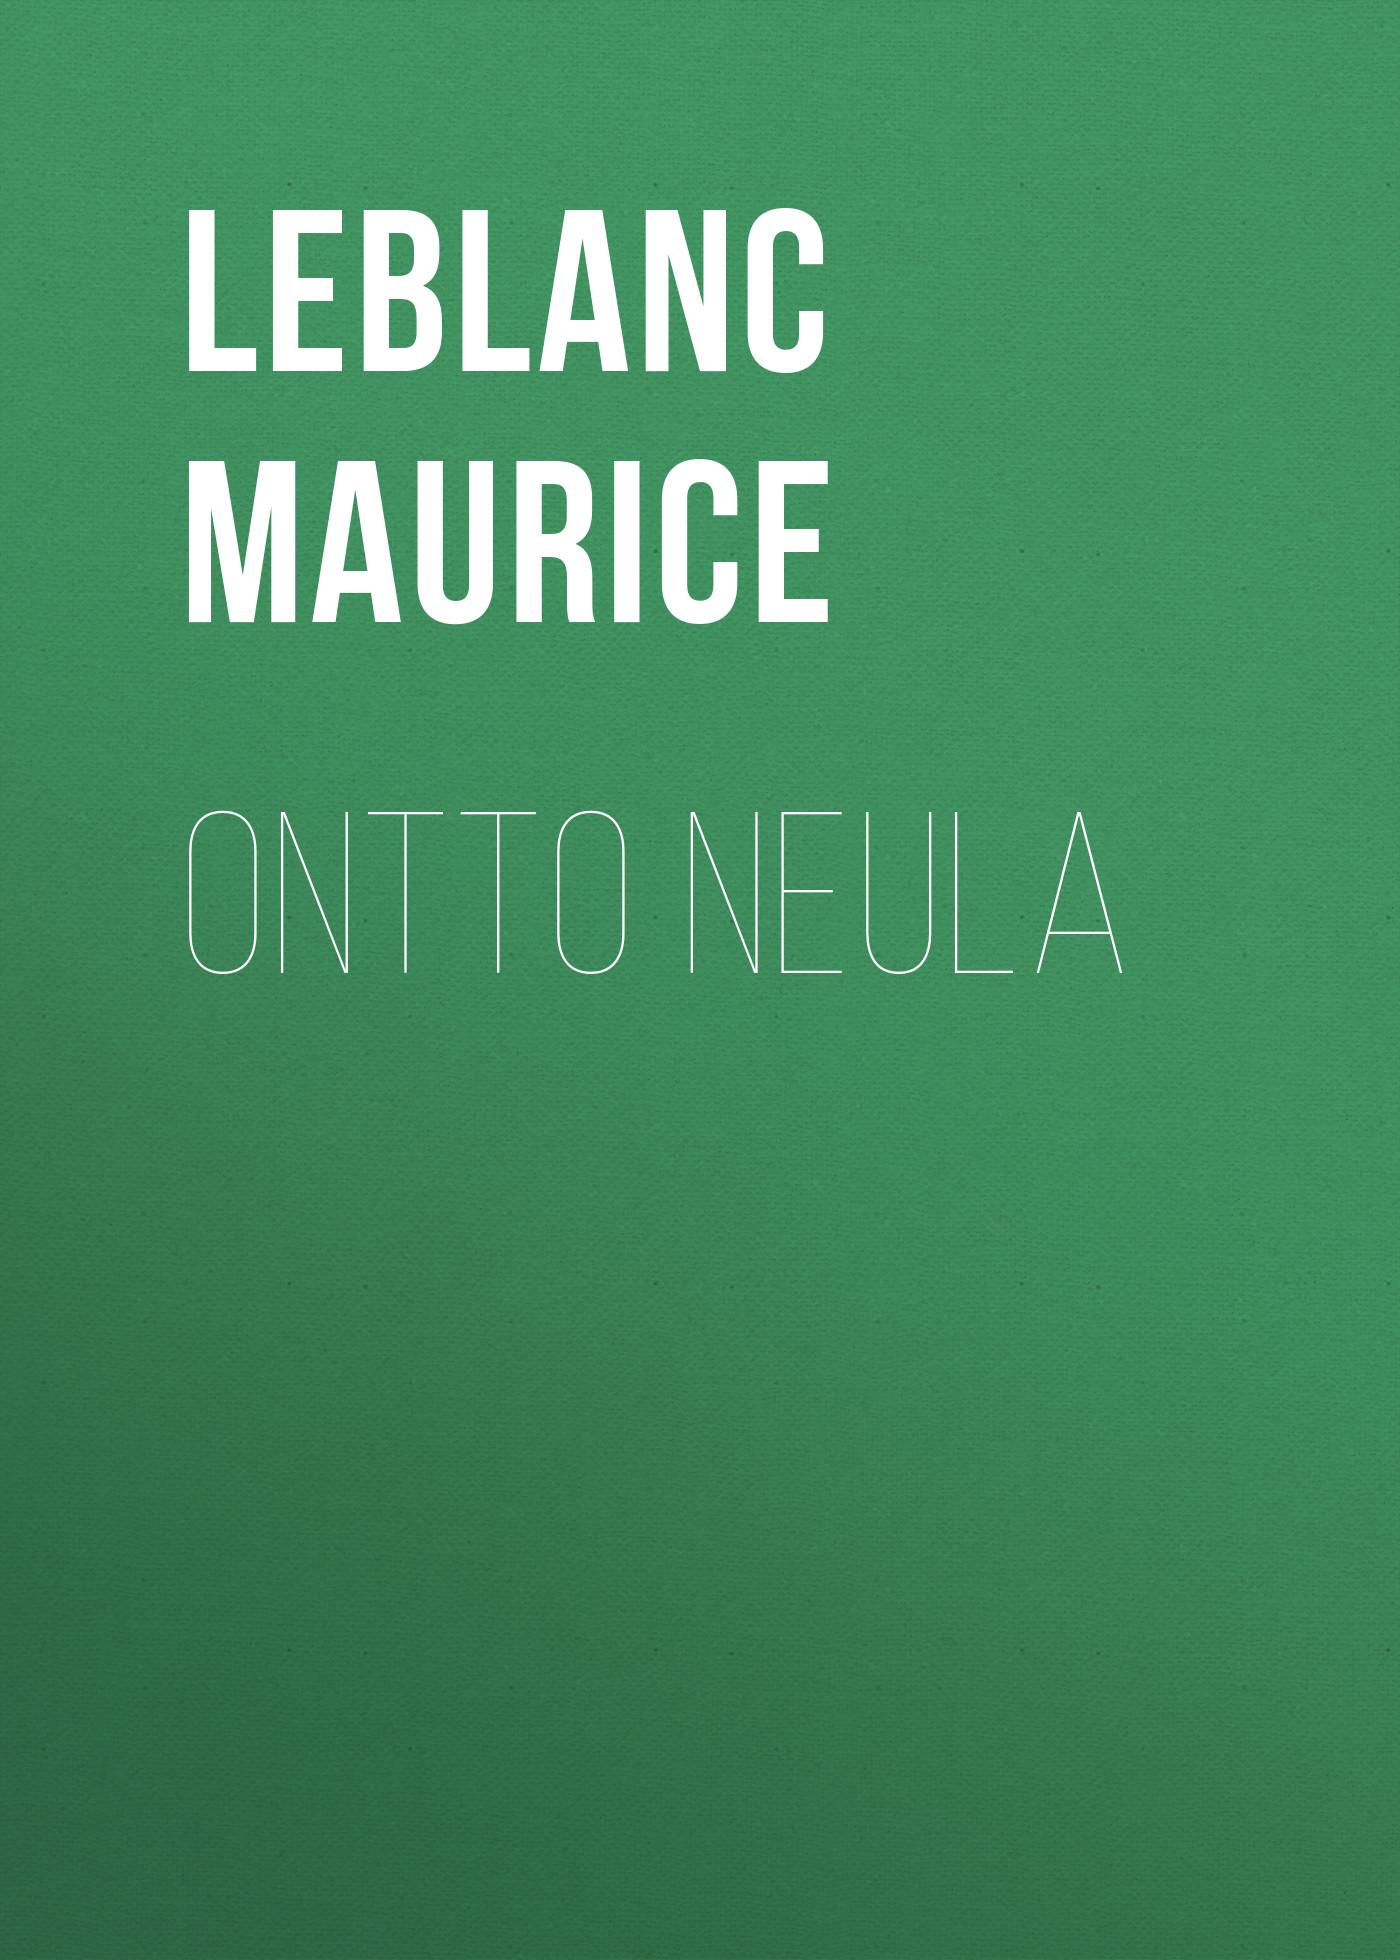 Leblanc Maurice Ontto neula анисимова т французский детектив м леблан признания арсена люпена maurice leblanc les confidences d arsene lupin